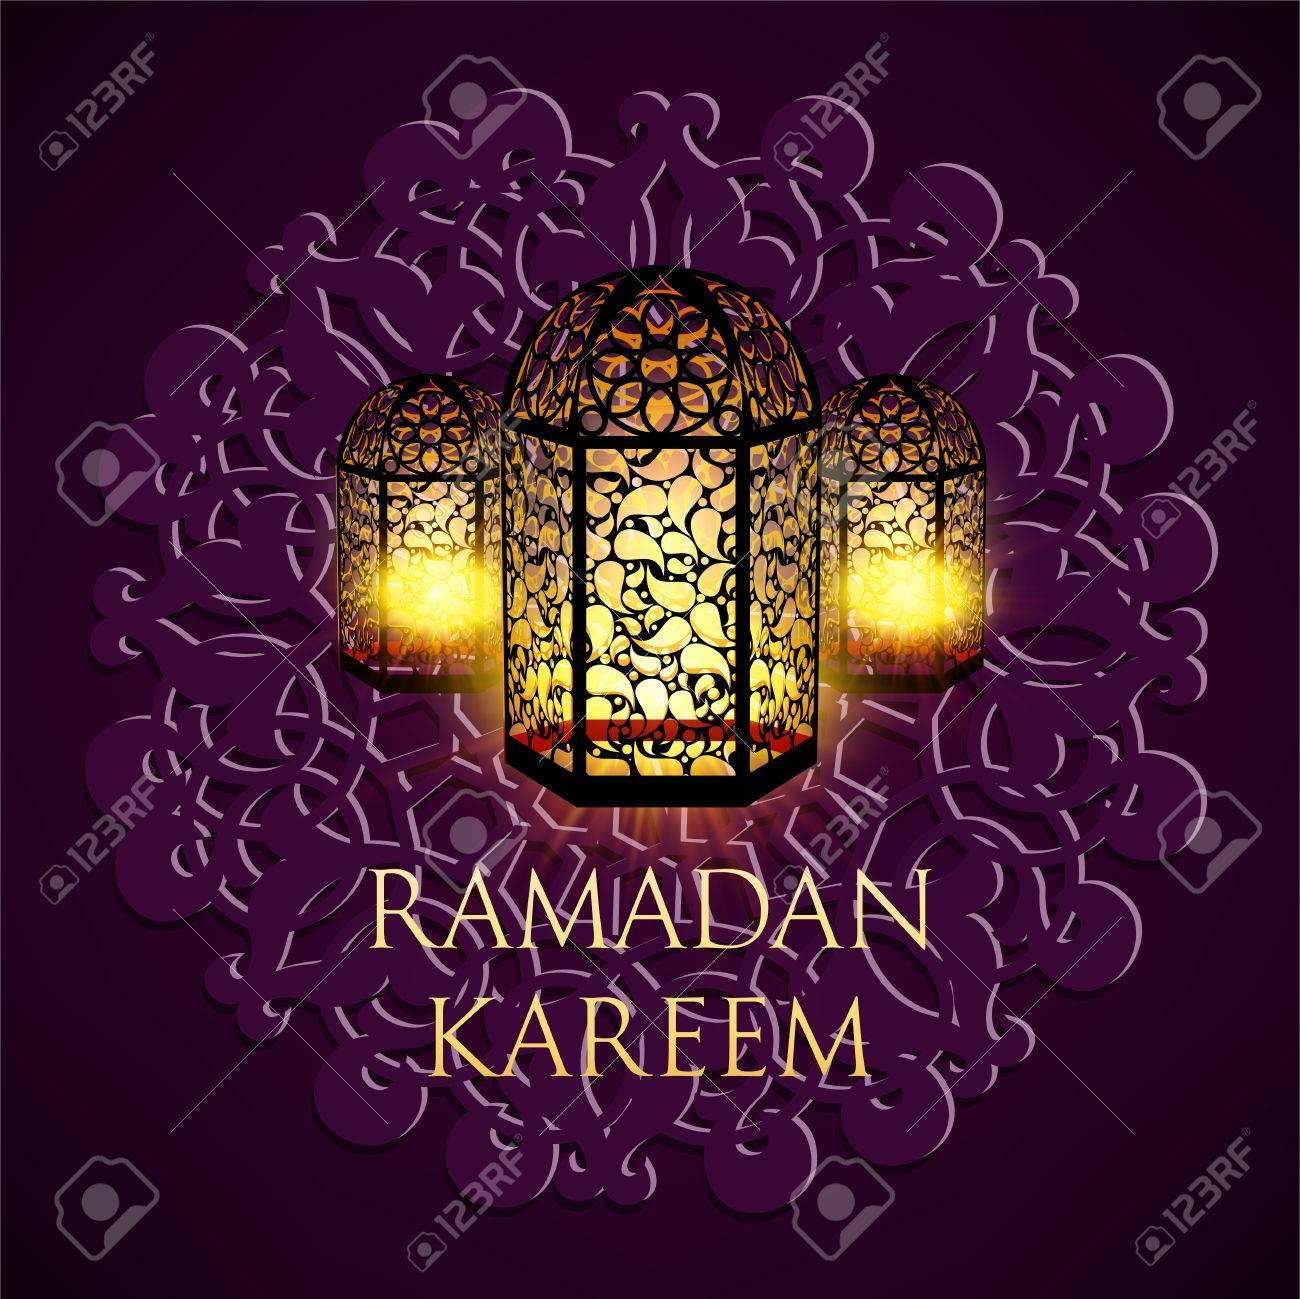 Ramadan Kareem Greeting Ornate Background Vector Illustration